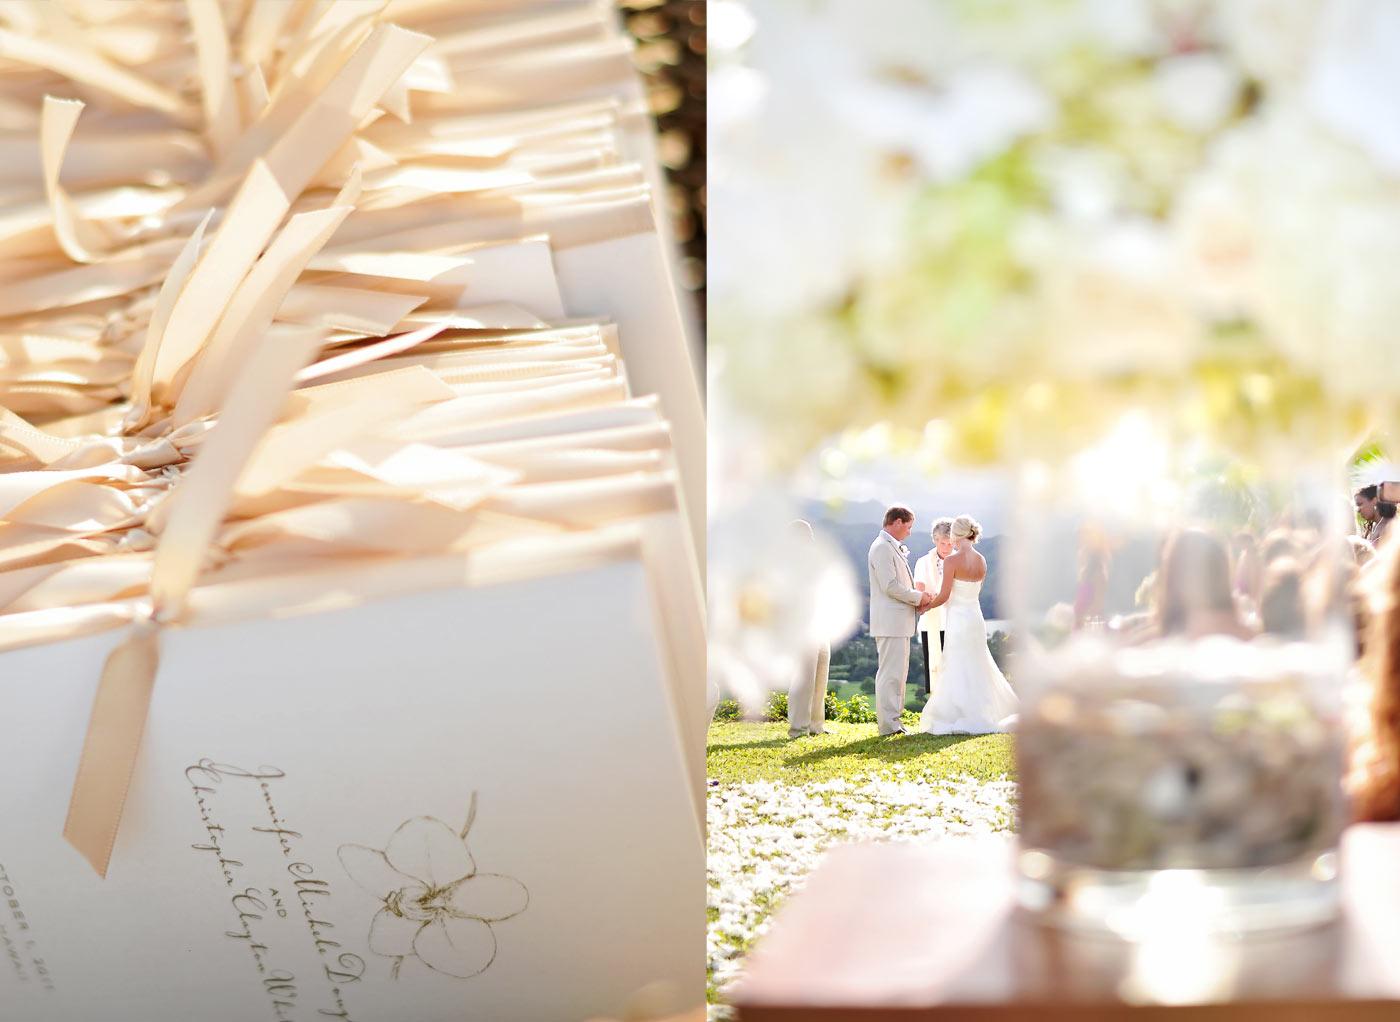 Kauai-wedding-photo-106.jpg